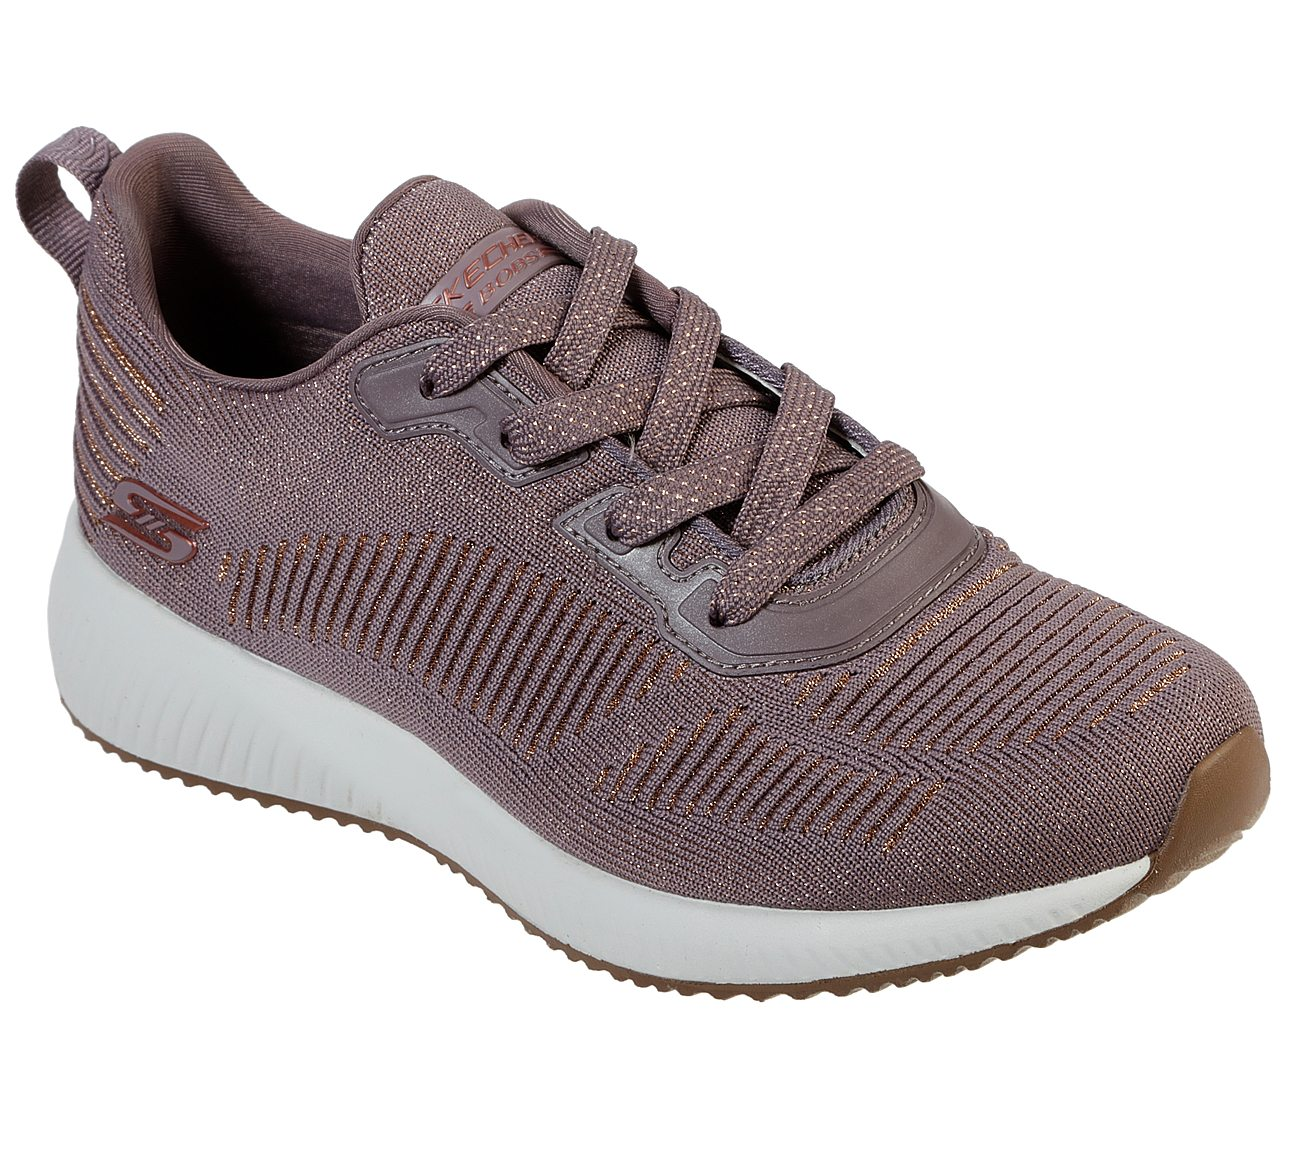 Eliminar Descriptivo Empresa  Skechers BOBS SPORT SQUAD – GLAM LEAGUE MAUVE (31347) – Shoe Emporium  Mansfield